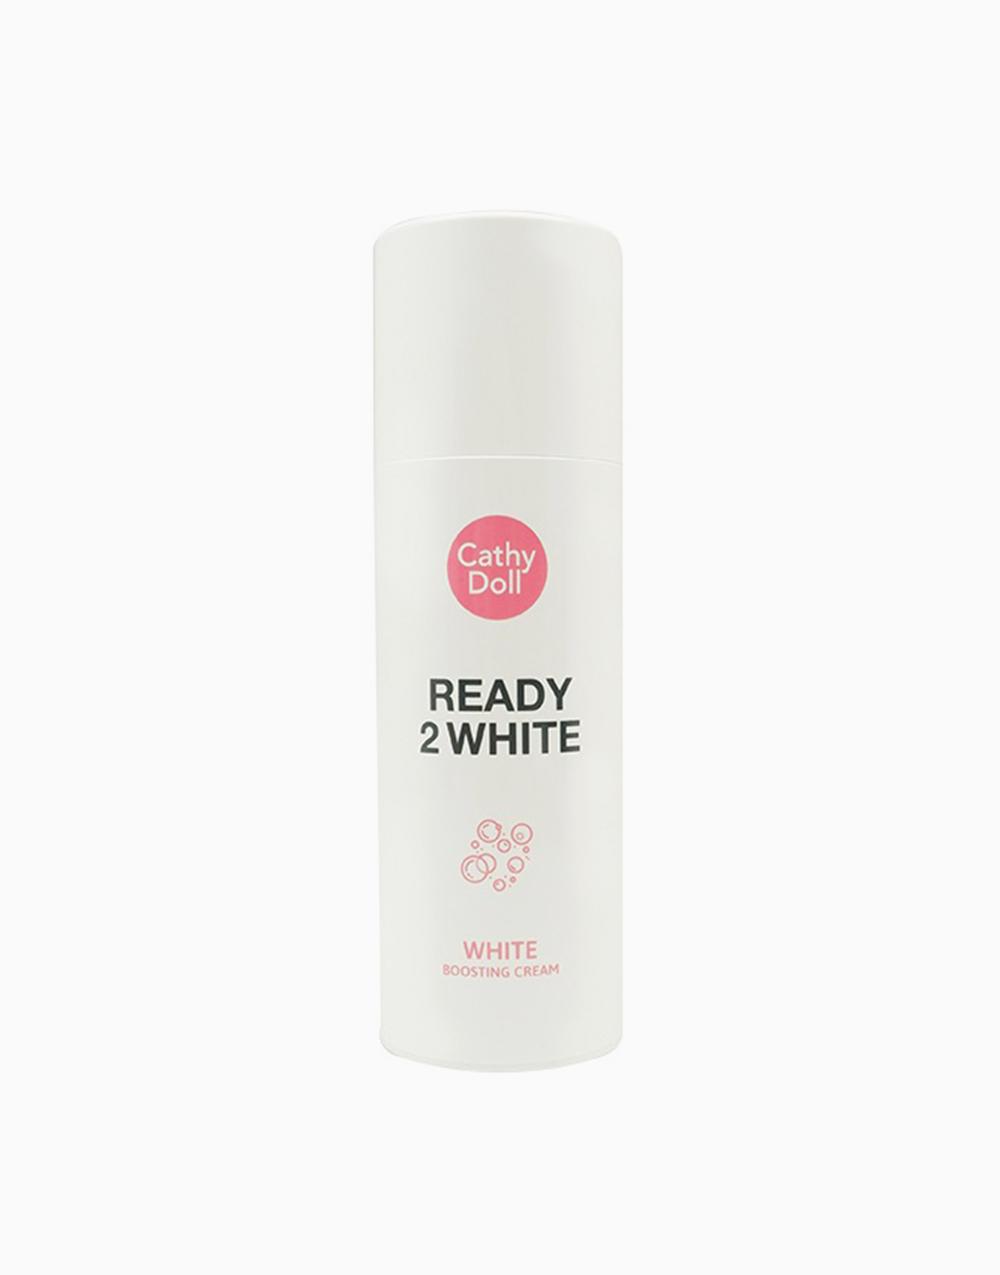 White Boosting Cream (75ml) by Cathy Doll